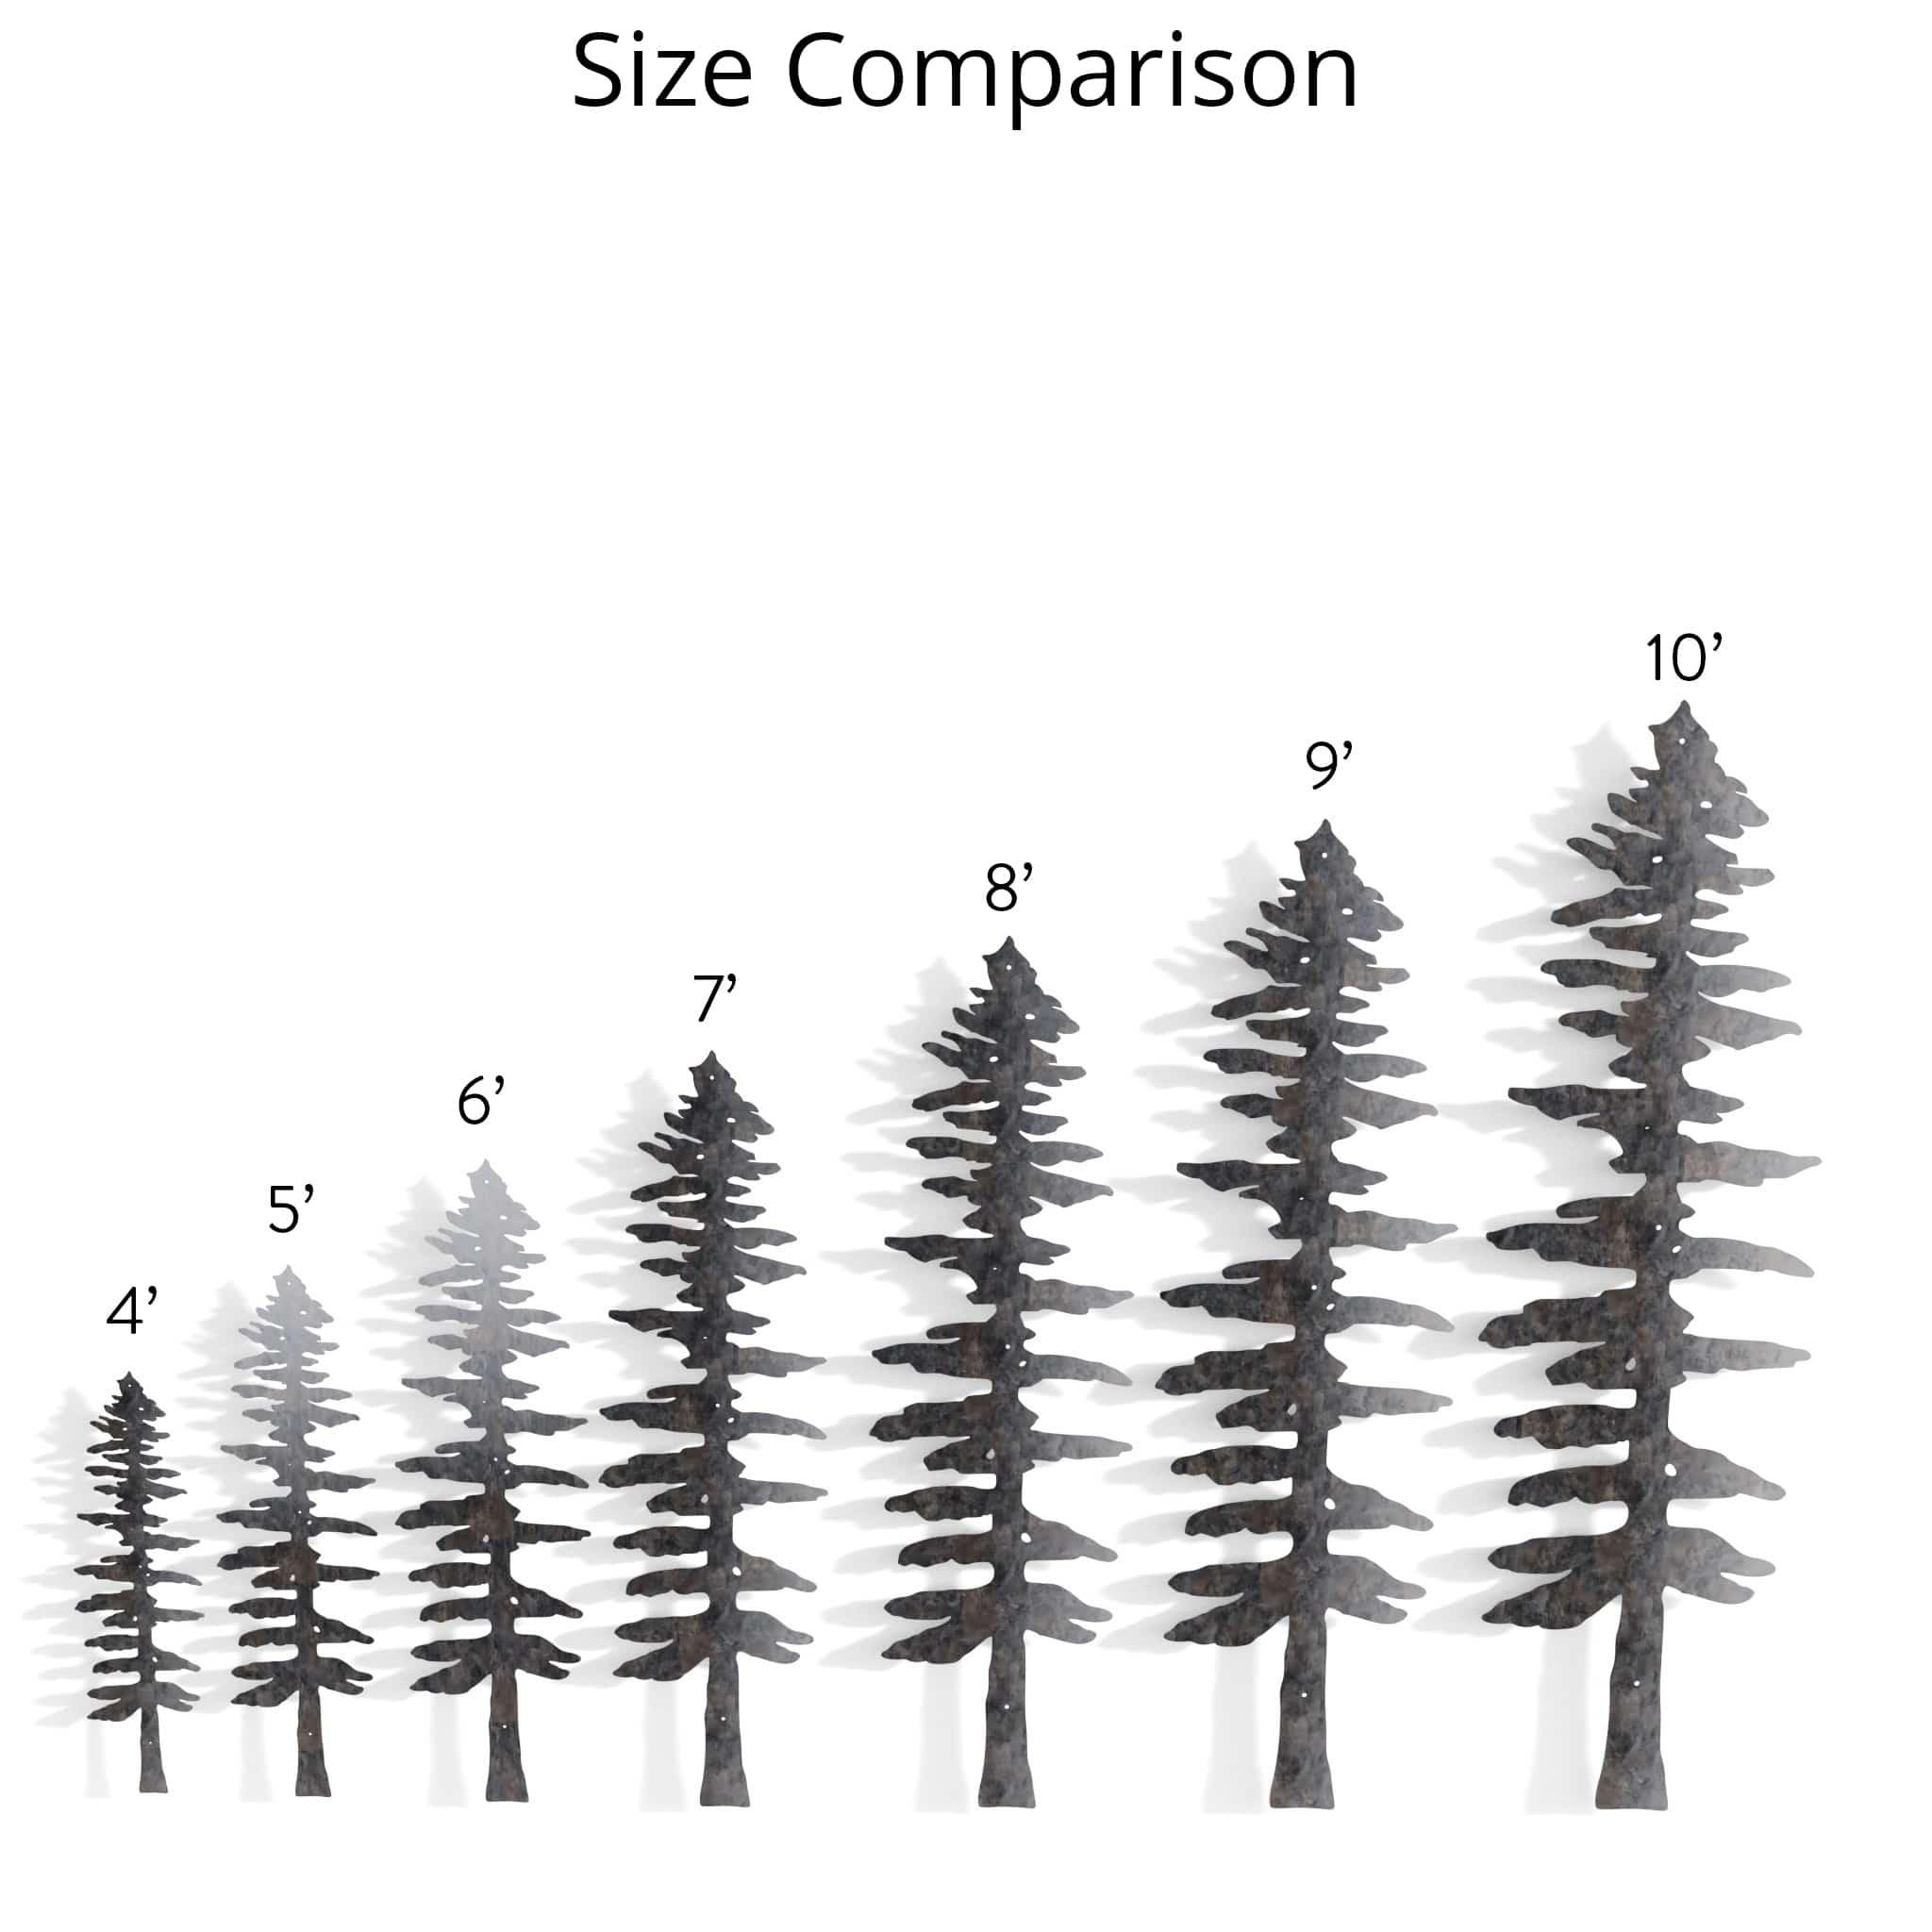 Sitka spruce - Tree